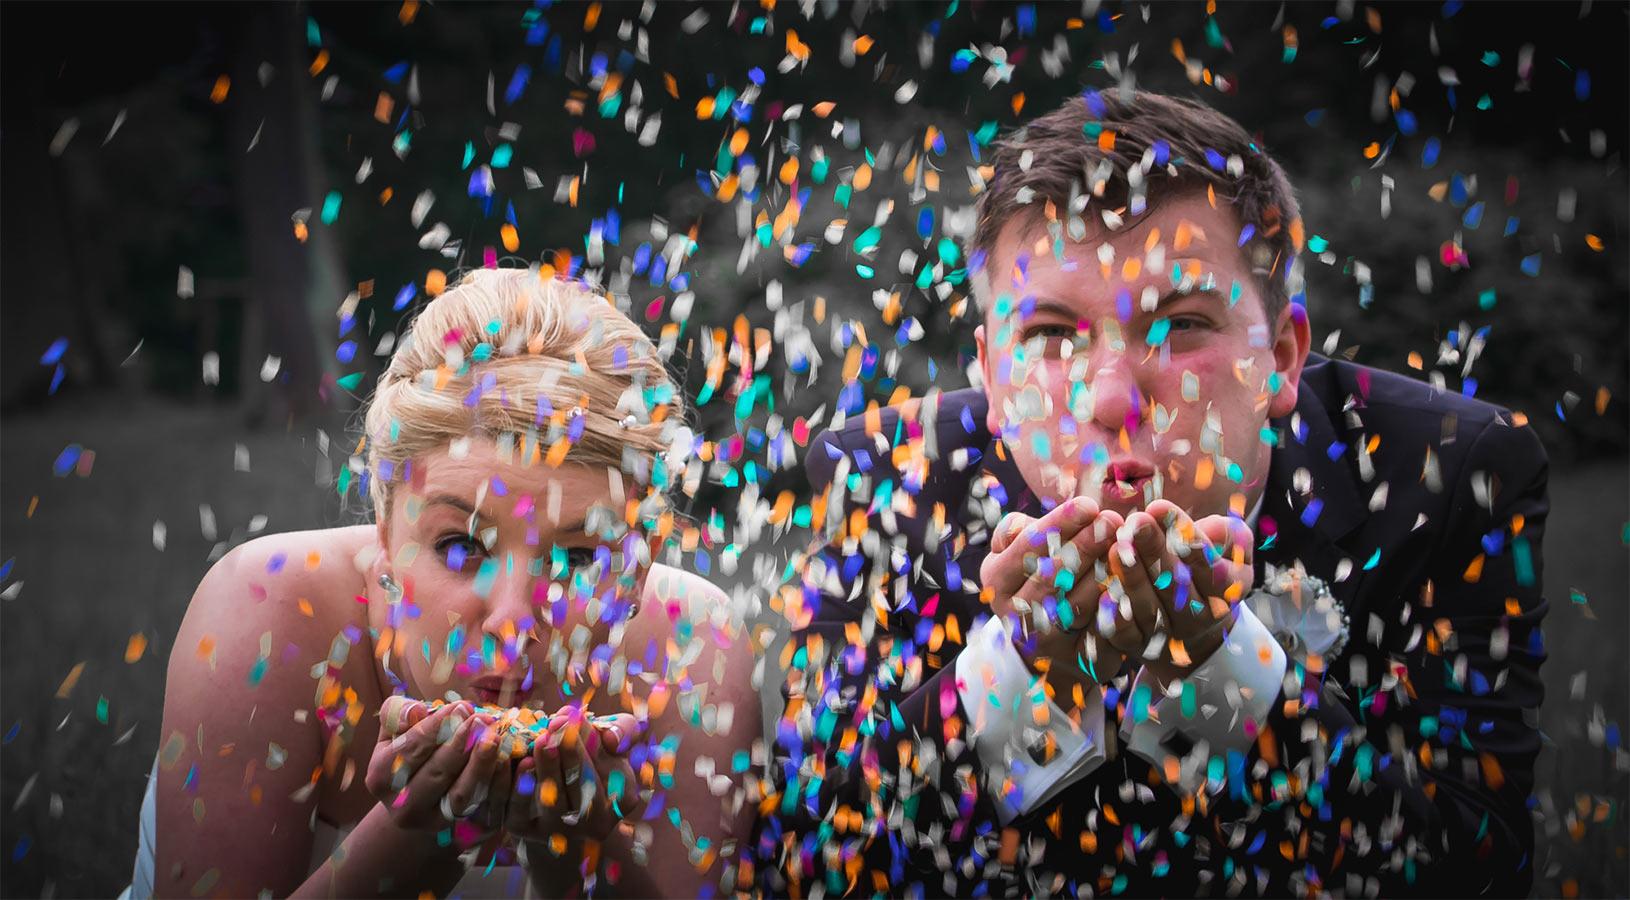 Hochzeits Momente Fotos